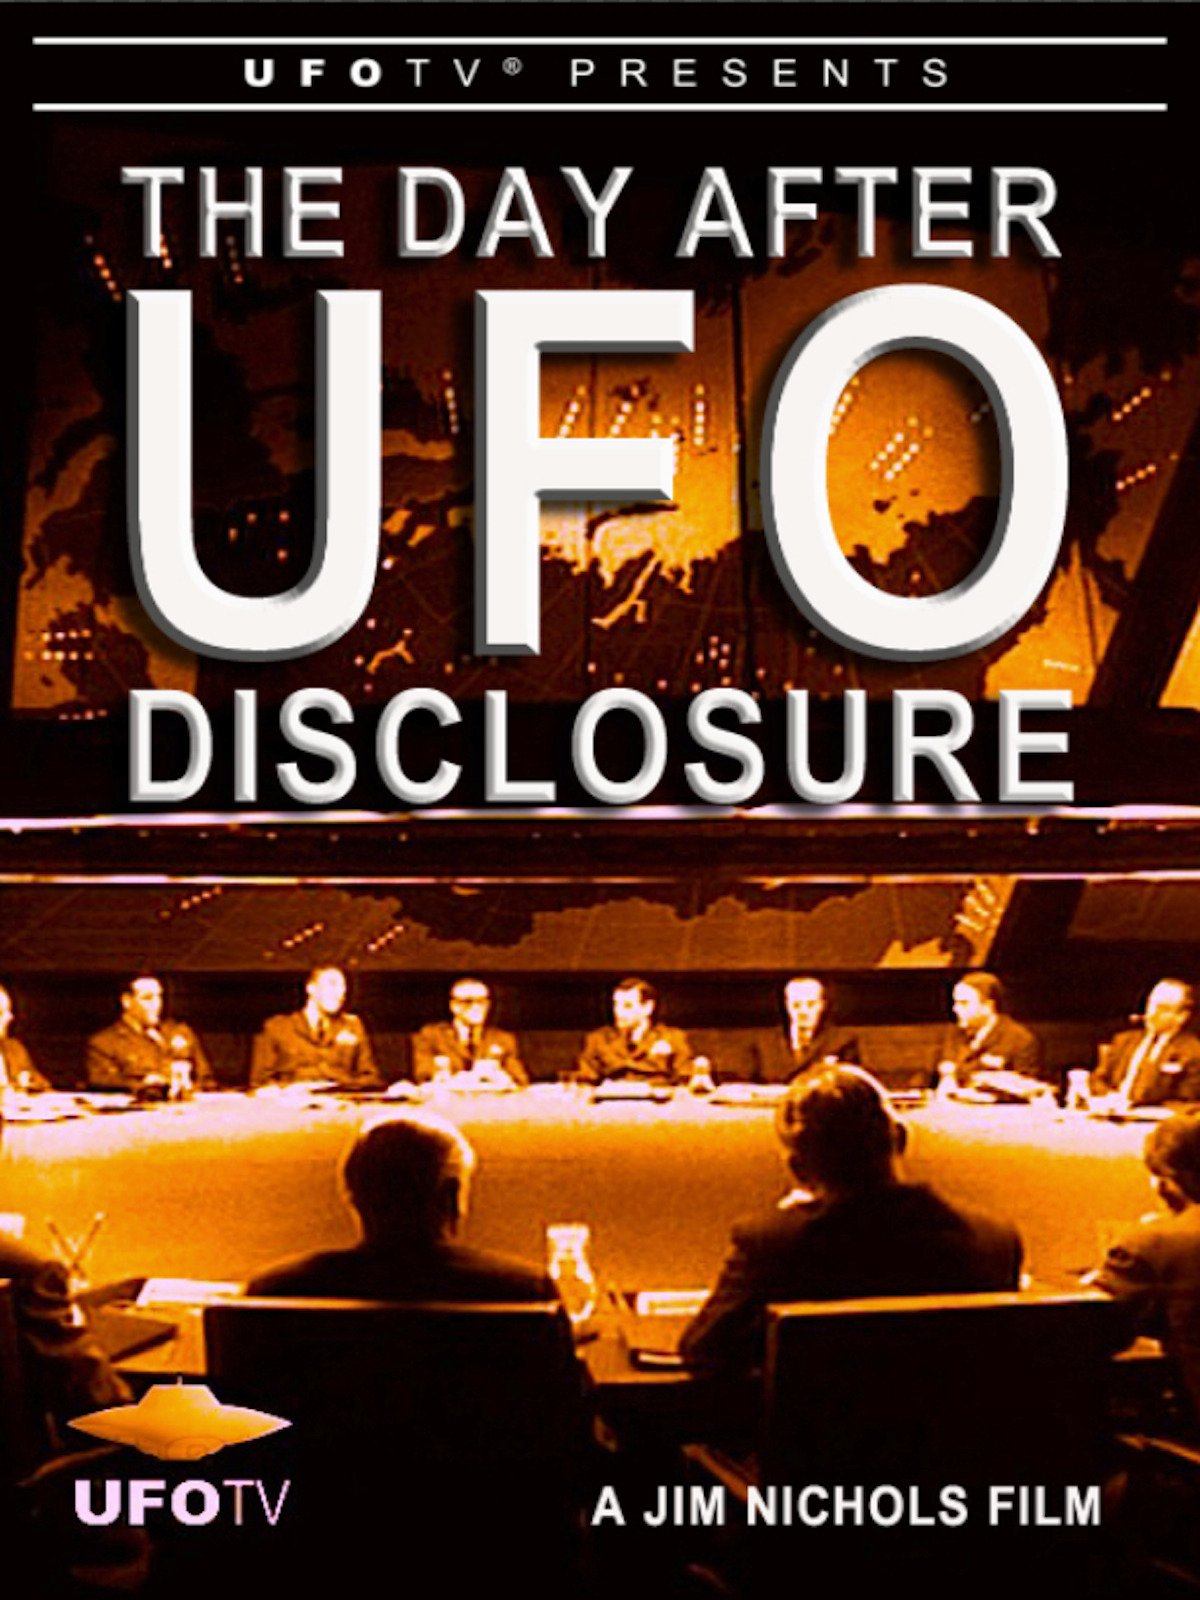 Amazon.com: UFOTV Presents The Day After UFO Disclosure: Jim Nichols: Amazon  Digital Services LLC